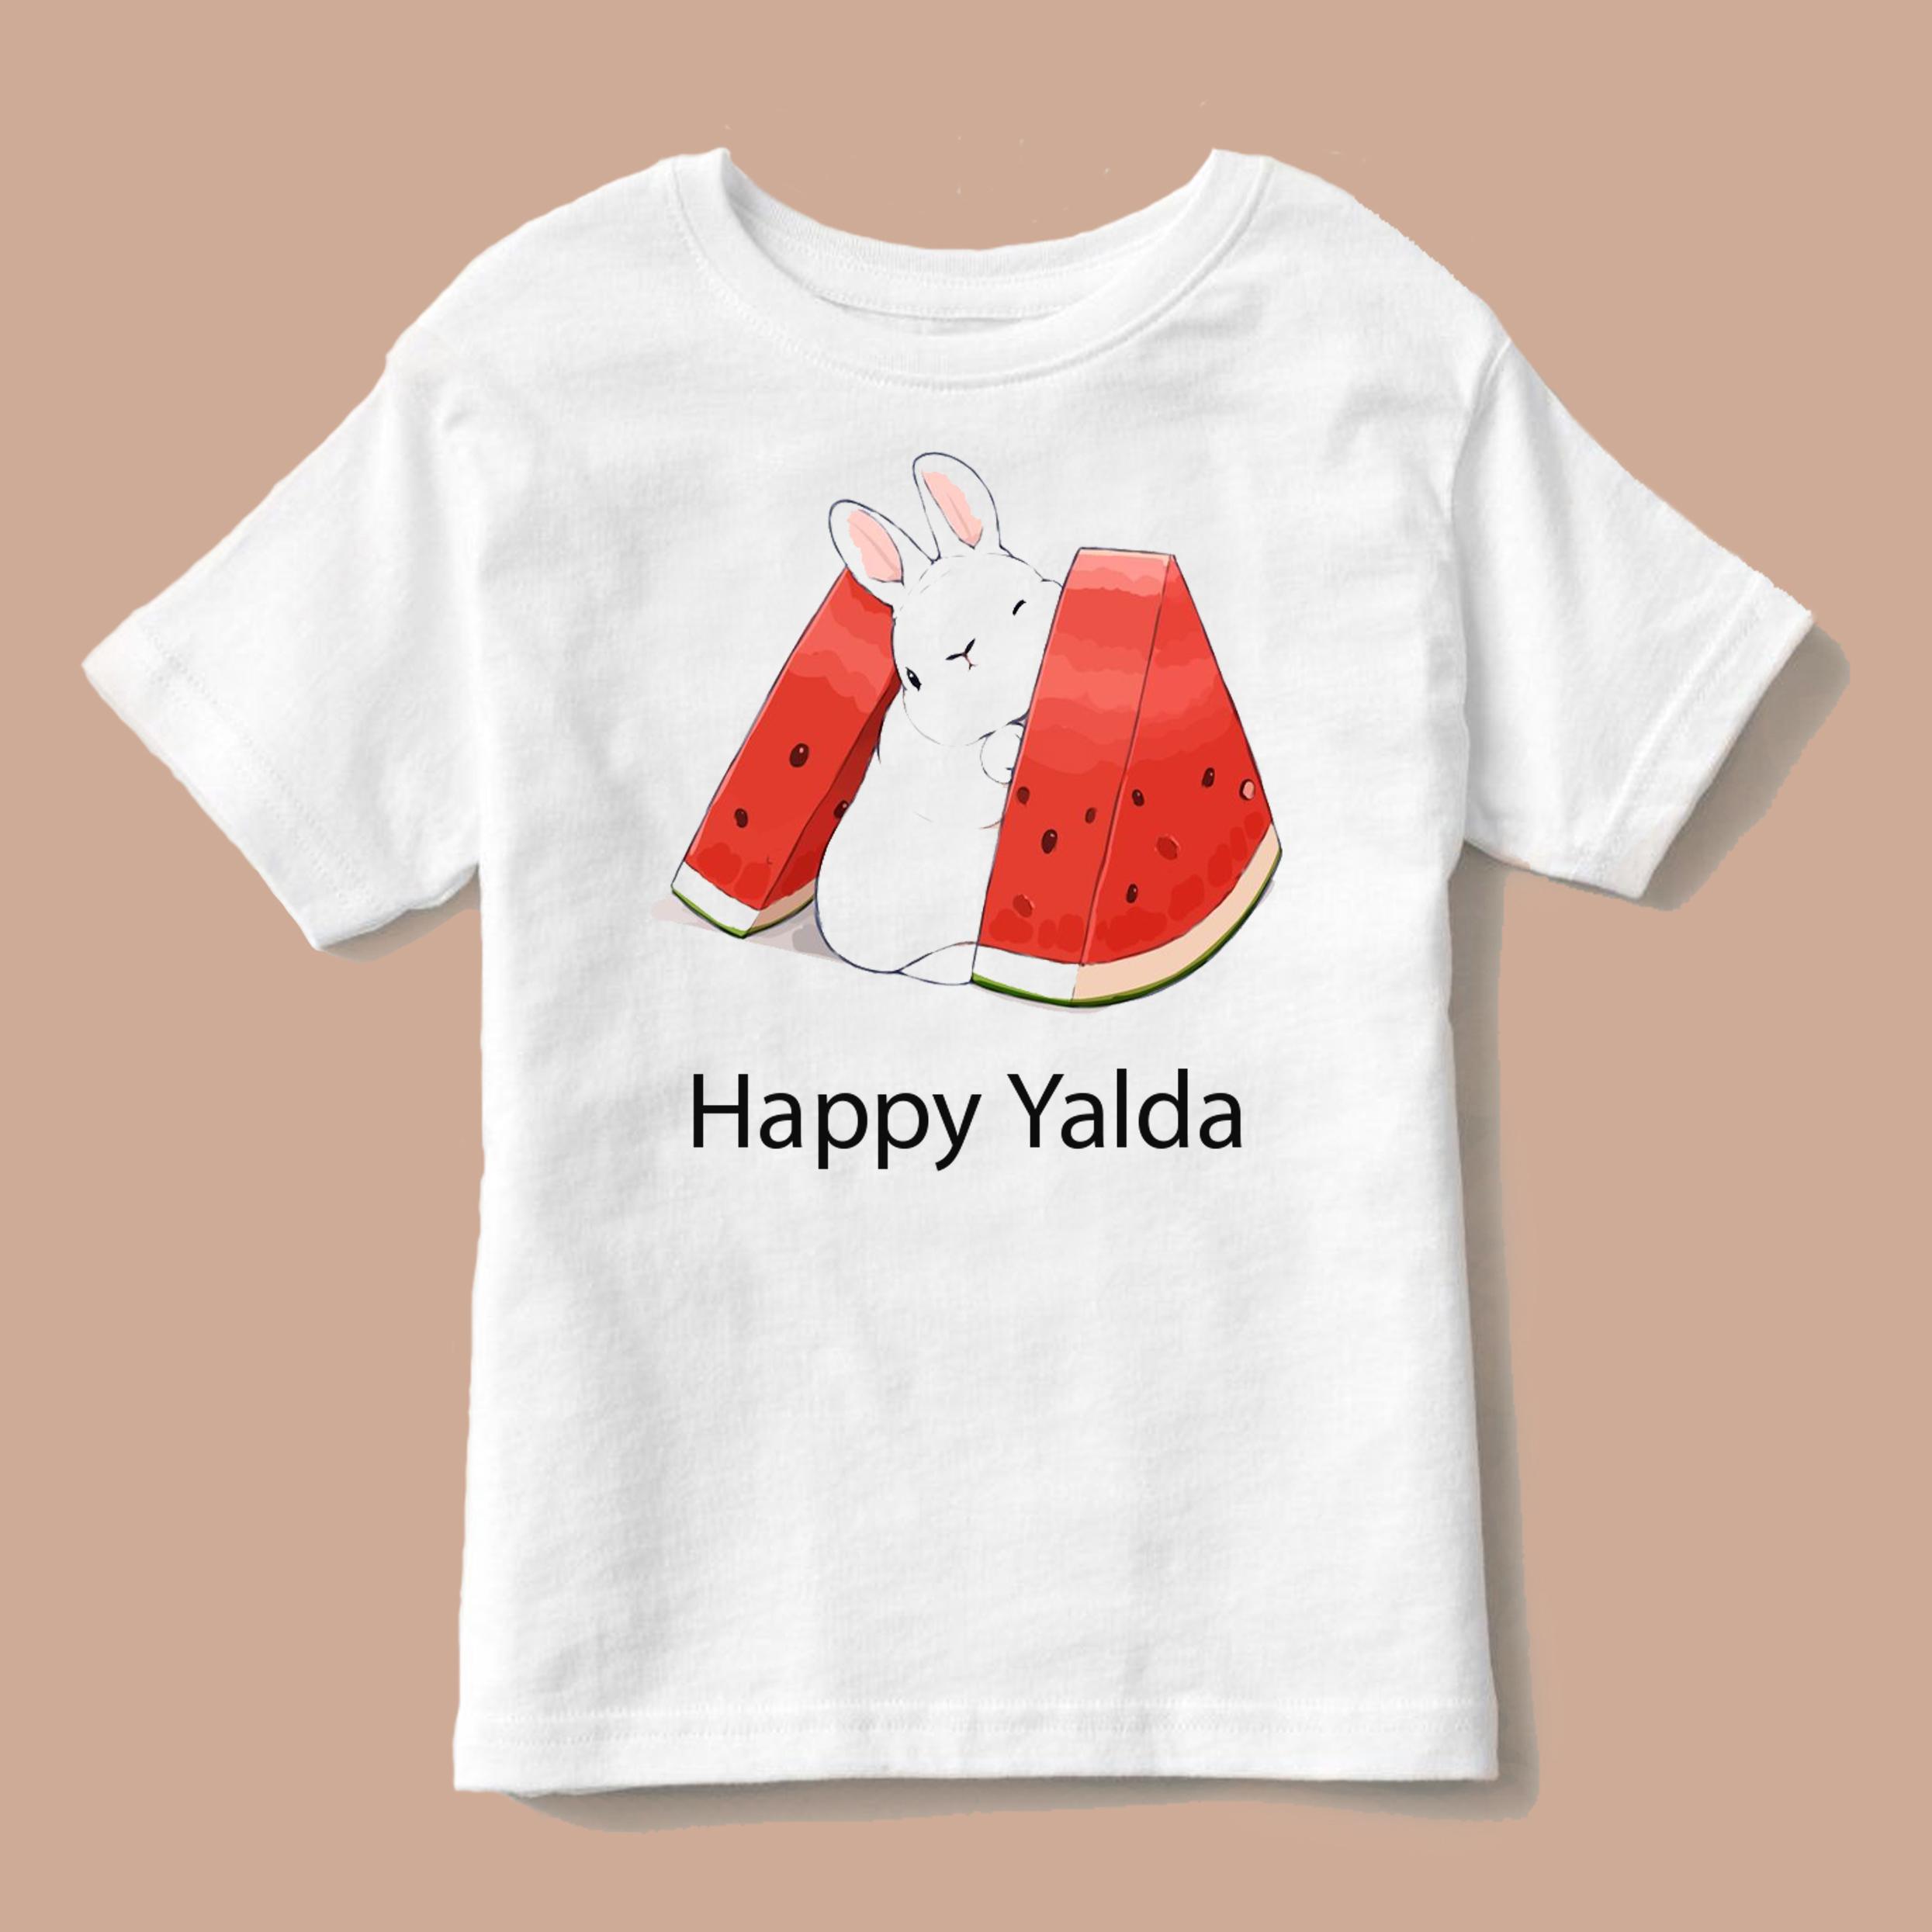 تی شرت بچگانه طرح هندوانه یلدا کد p6